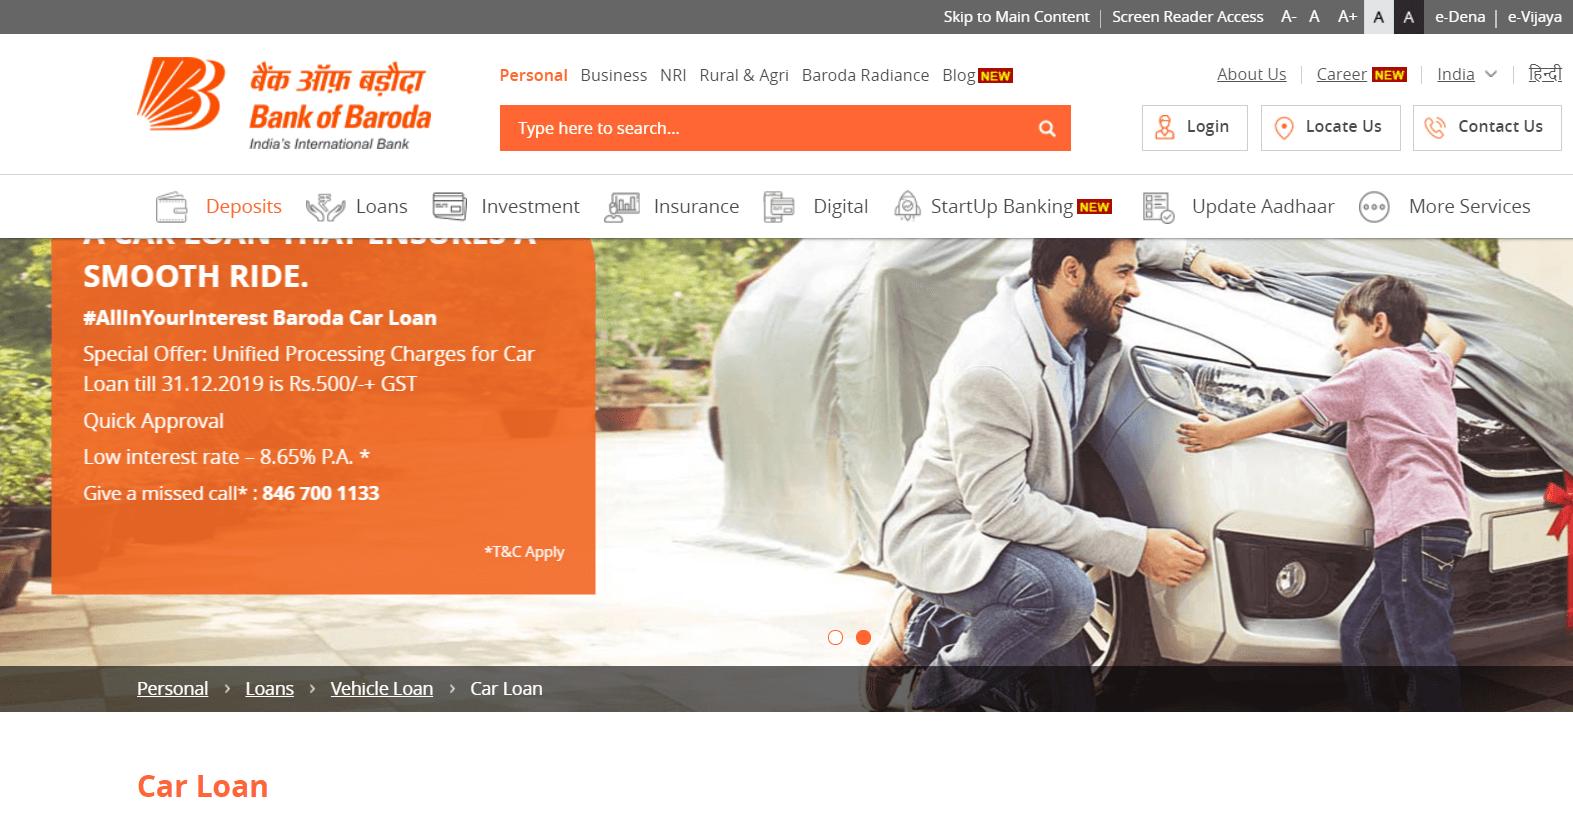 Bank of Baroda Car Loan